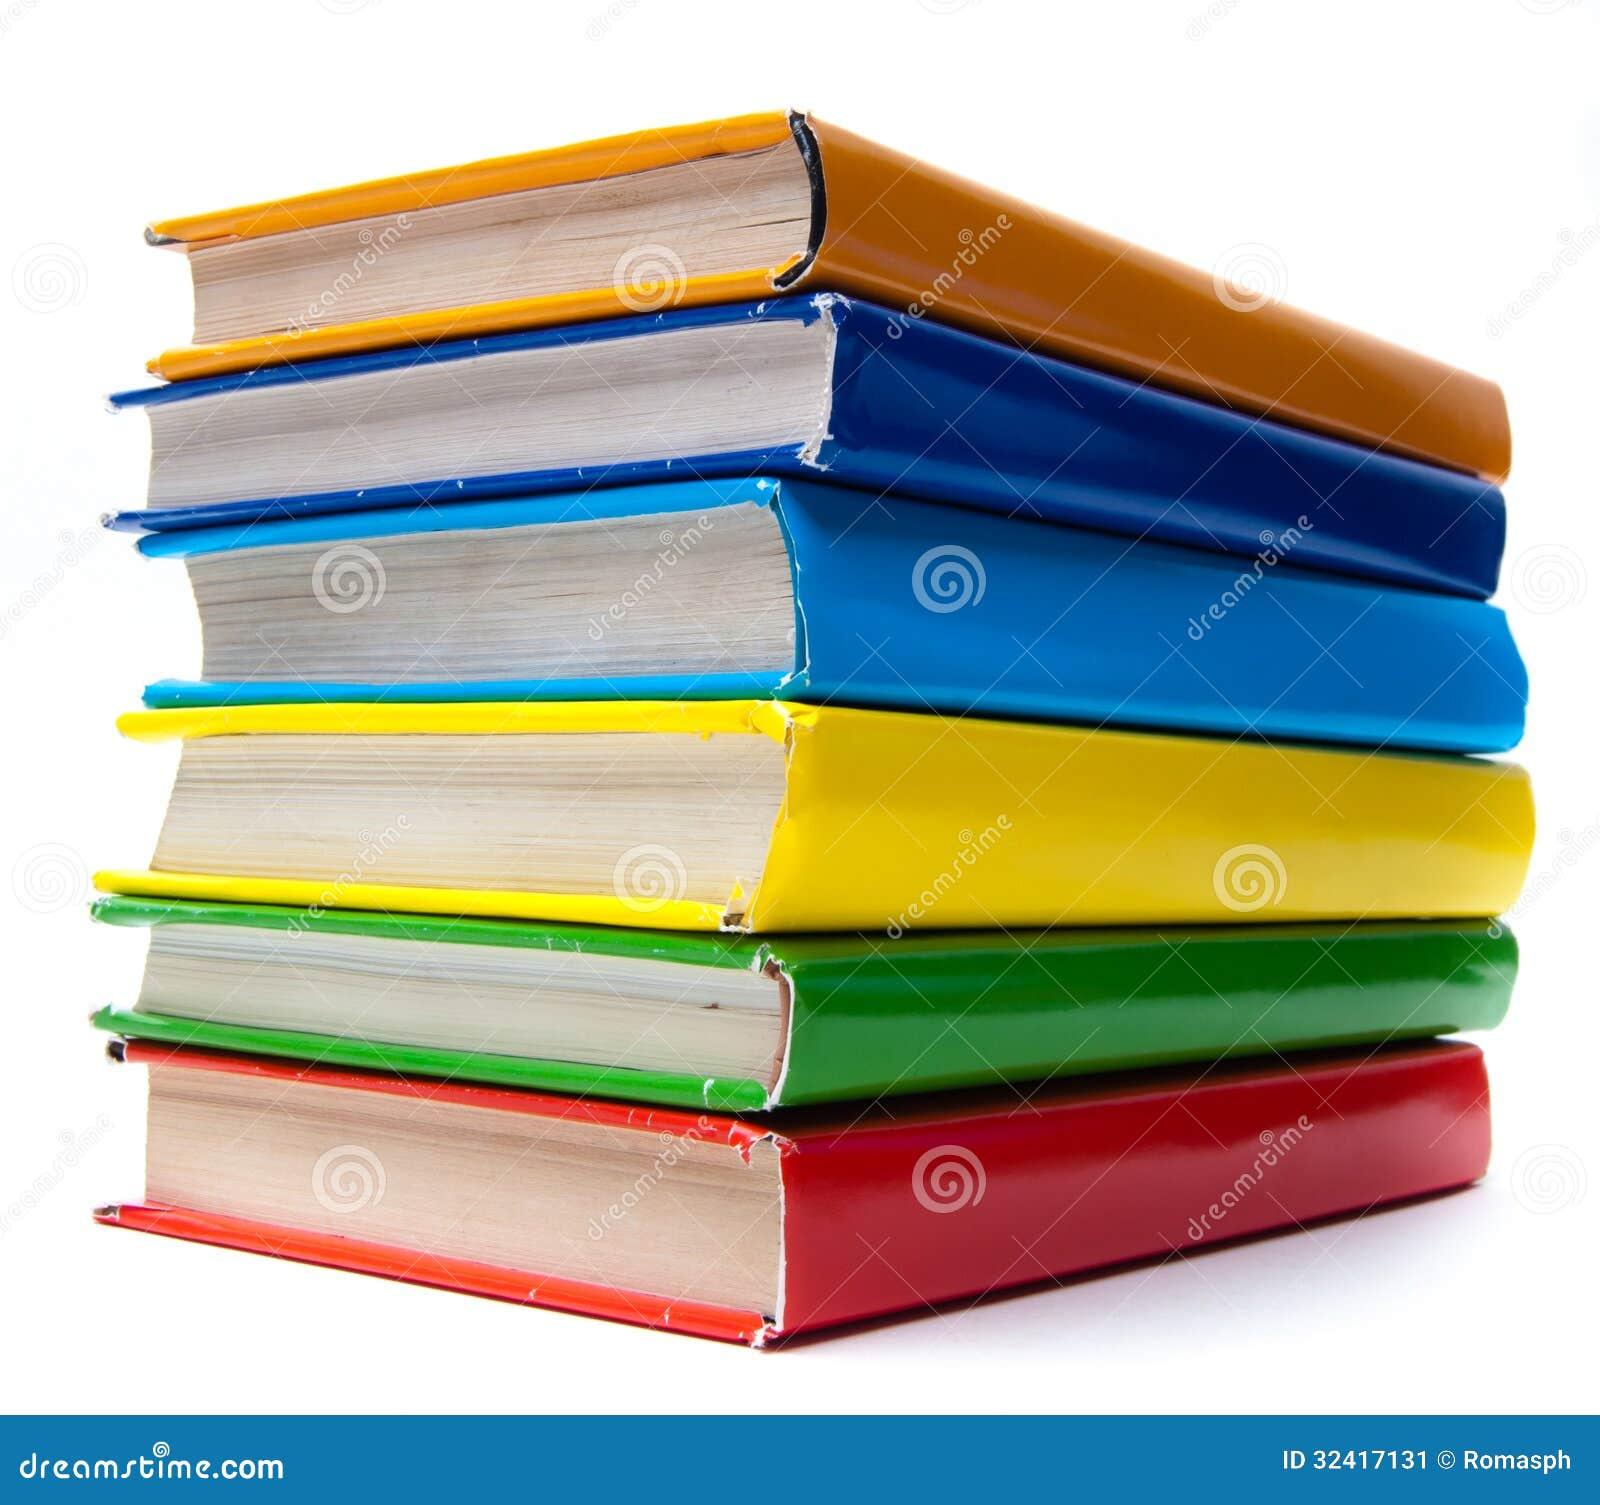 Colorful Books On White Background Stock Image - Image ...